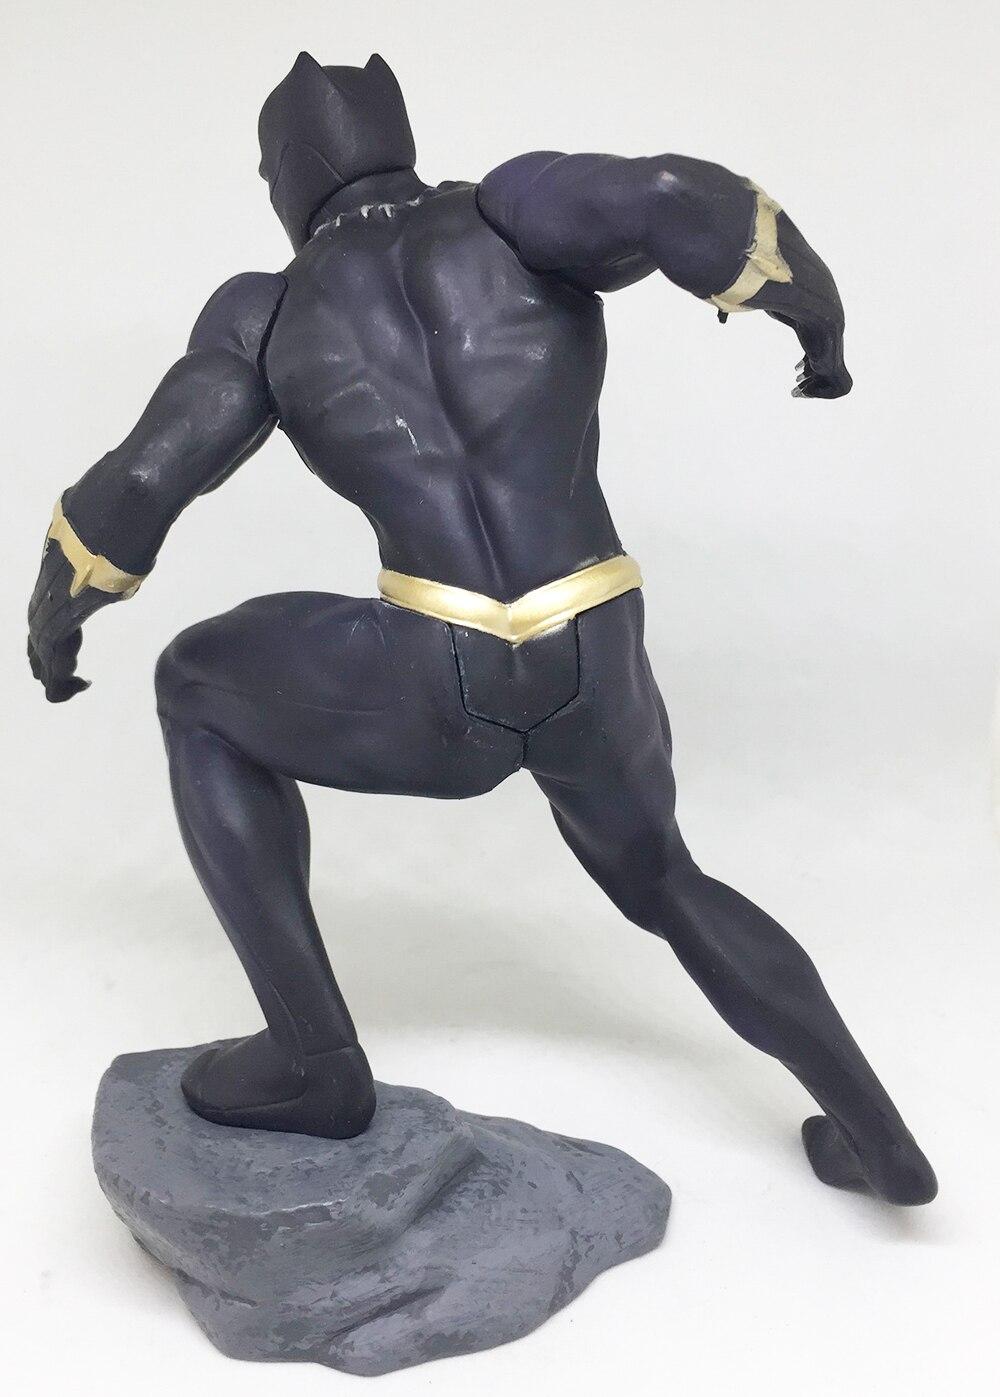 18cm Marvel Toys ARTFX Avengers Infinity War Black Panther PVC Action Figure Model Toy Christmas Gift (4)